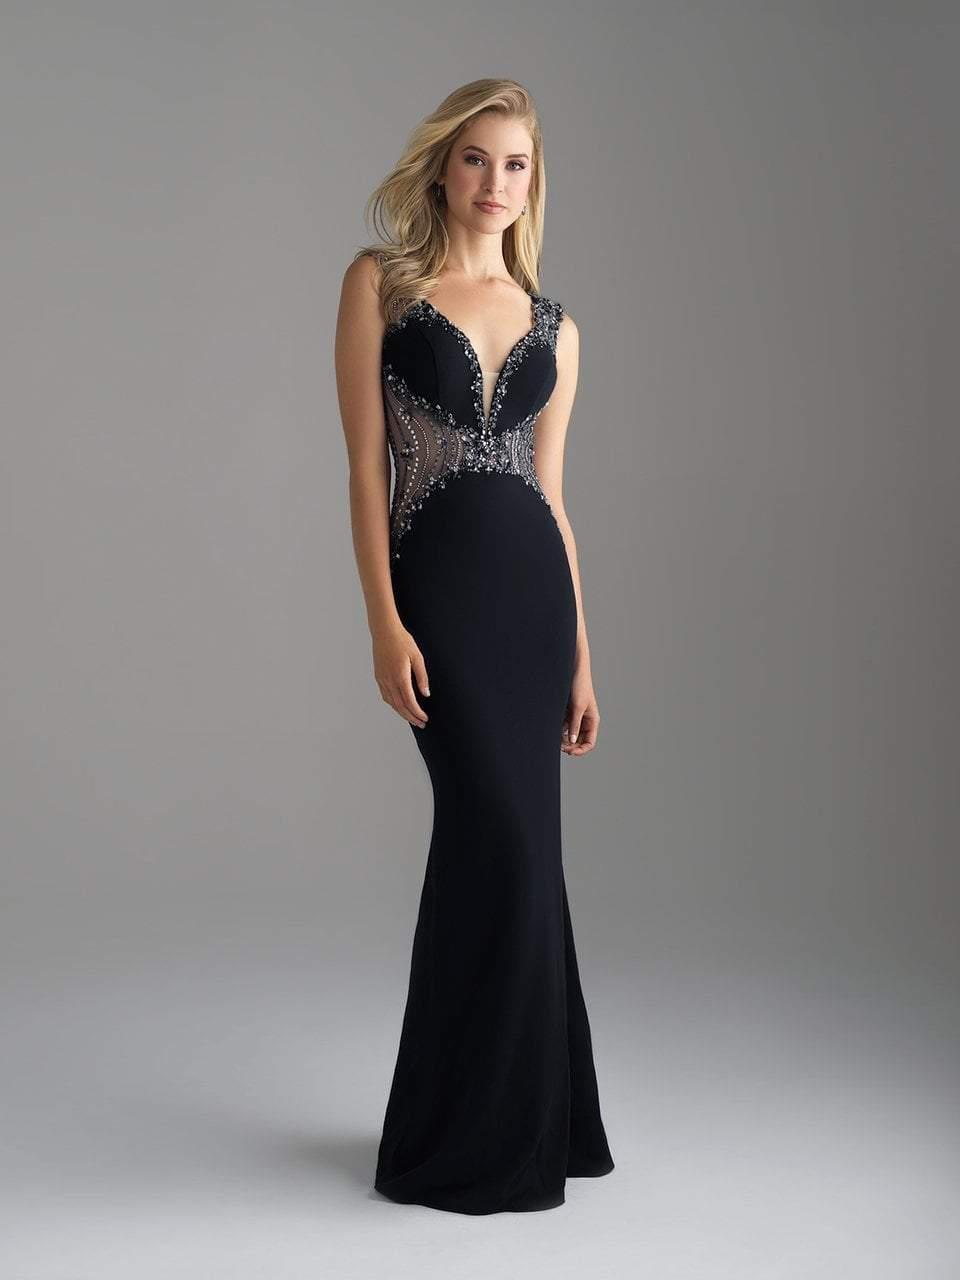 Madison James - 18-696 Embellished Deep V-neck Sheath Dress